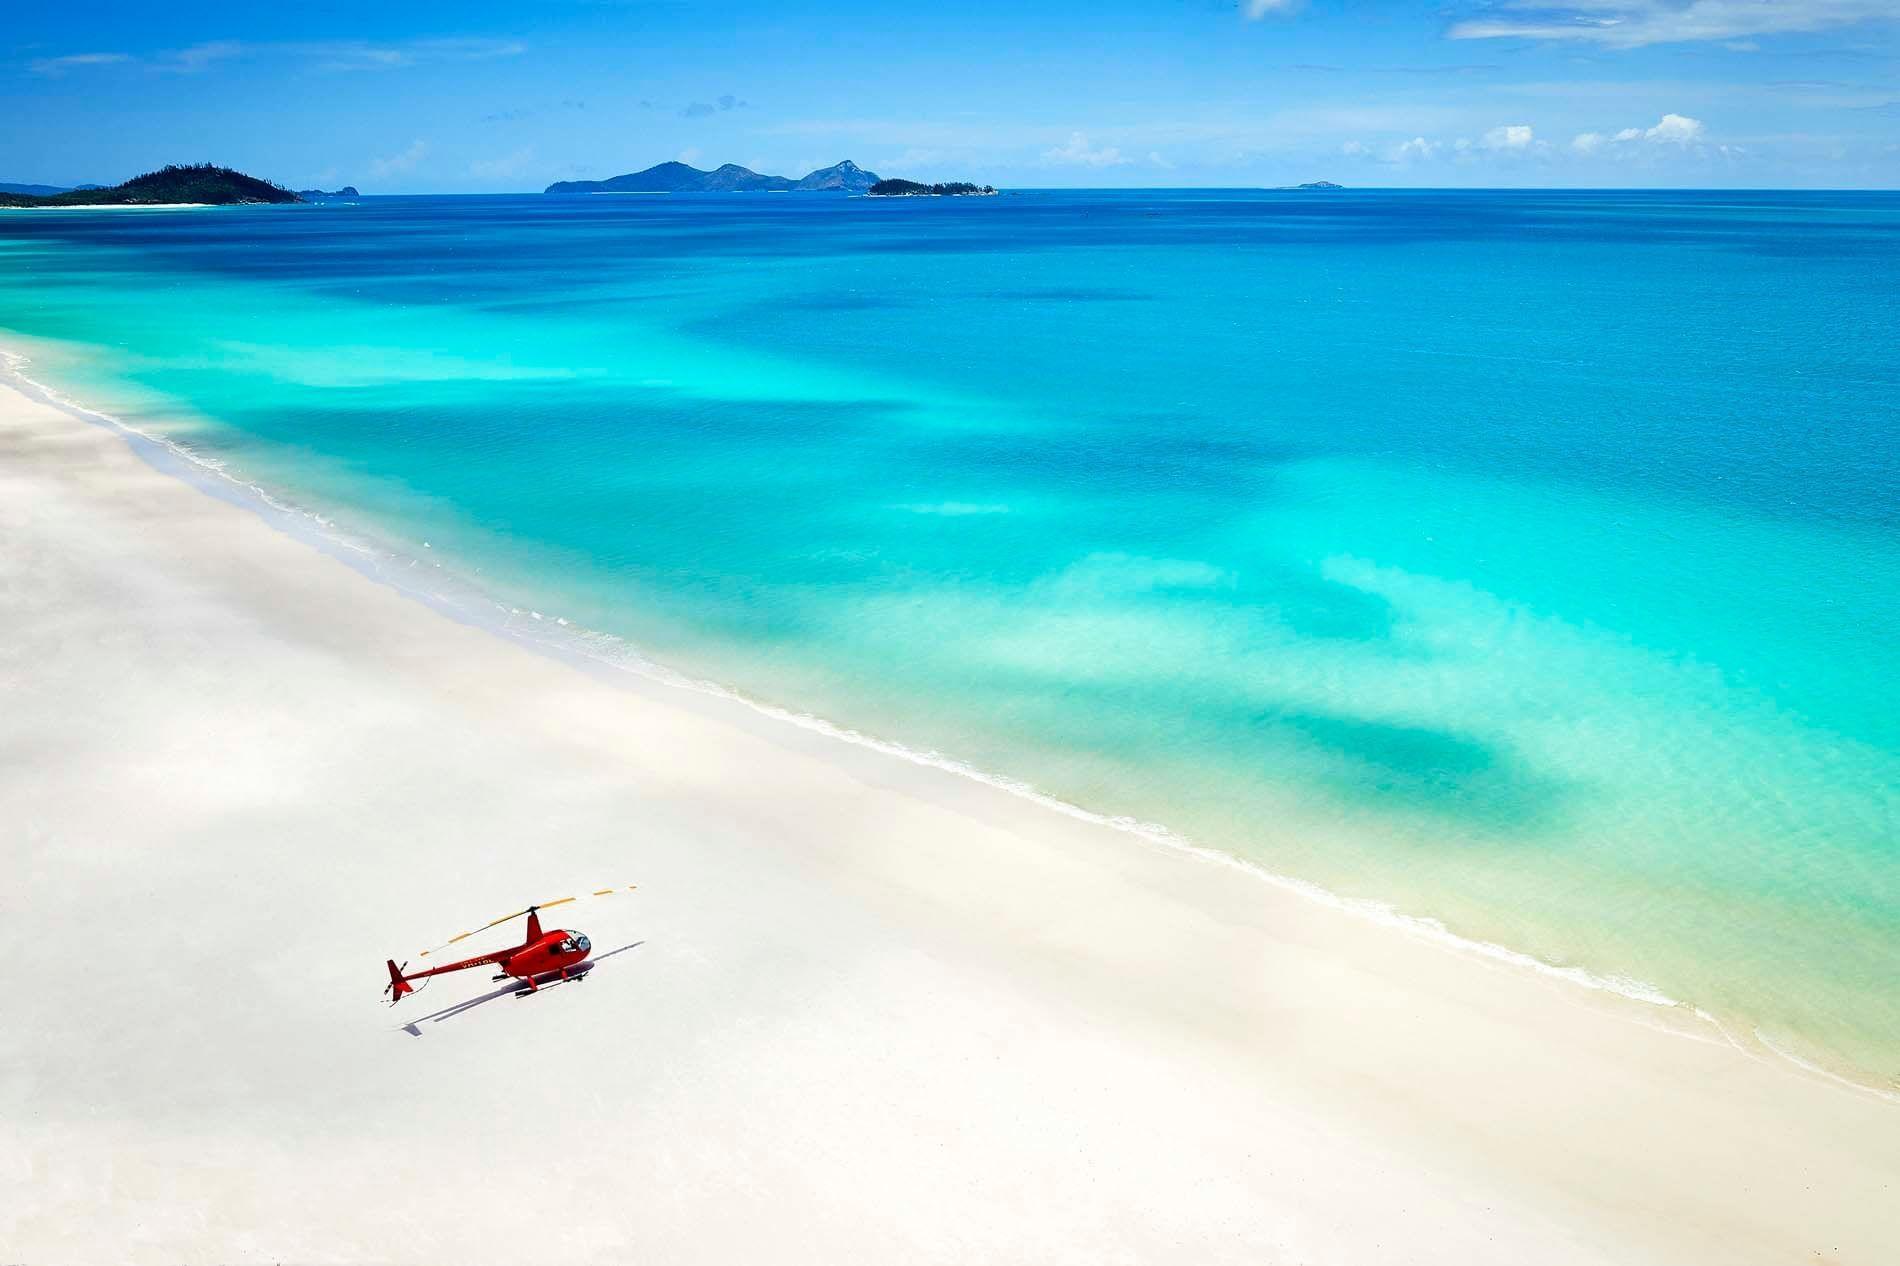 Helicopter on beach near Daydream Island Resort